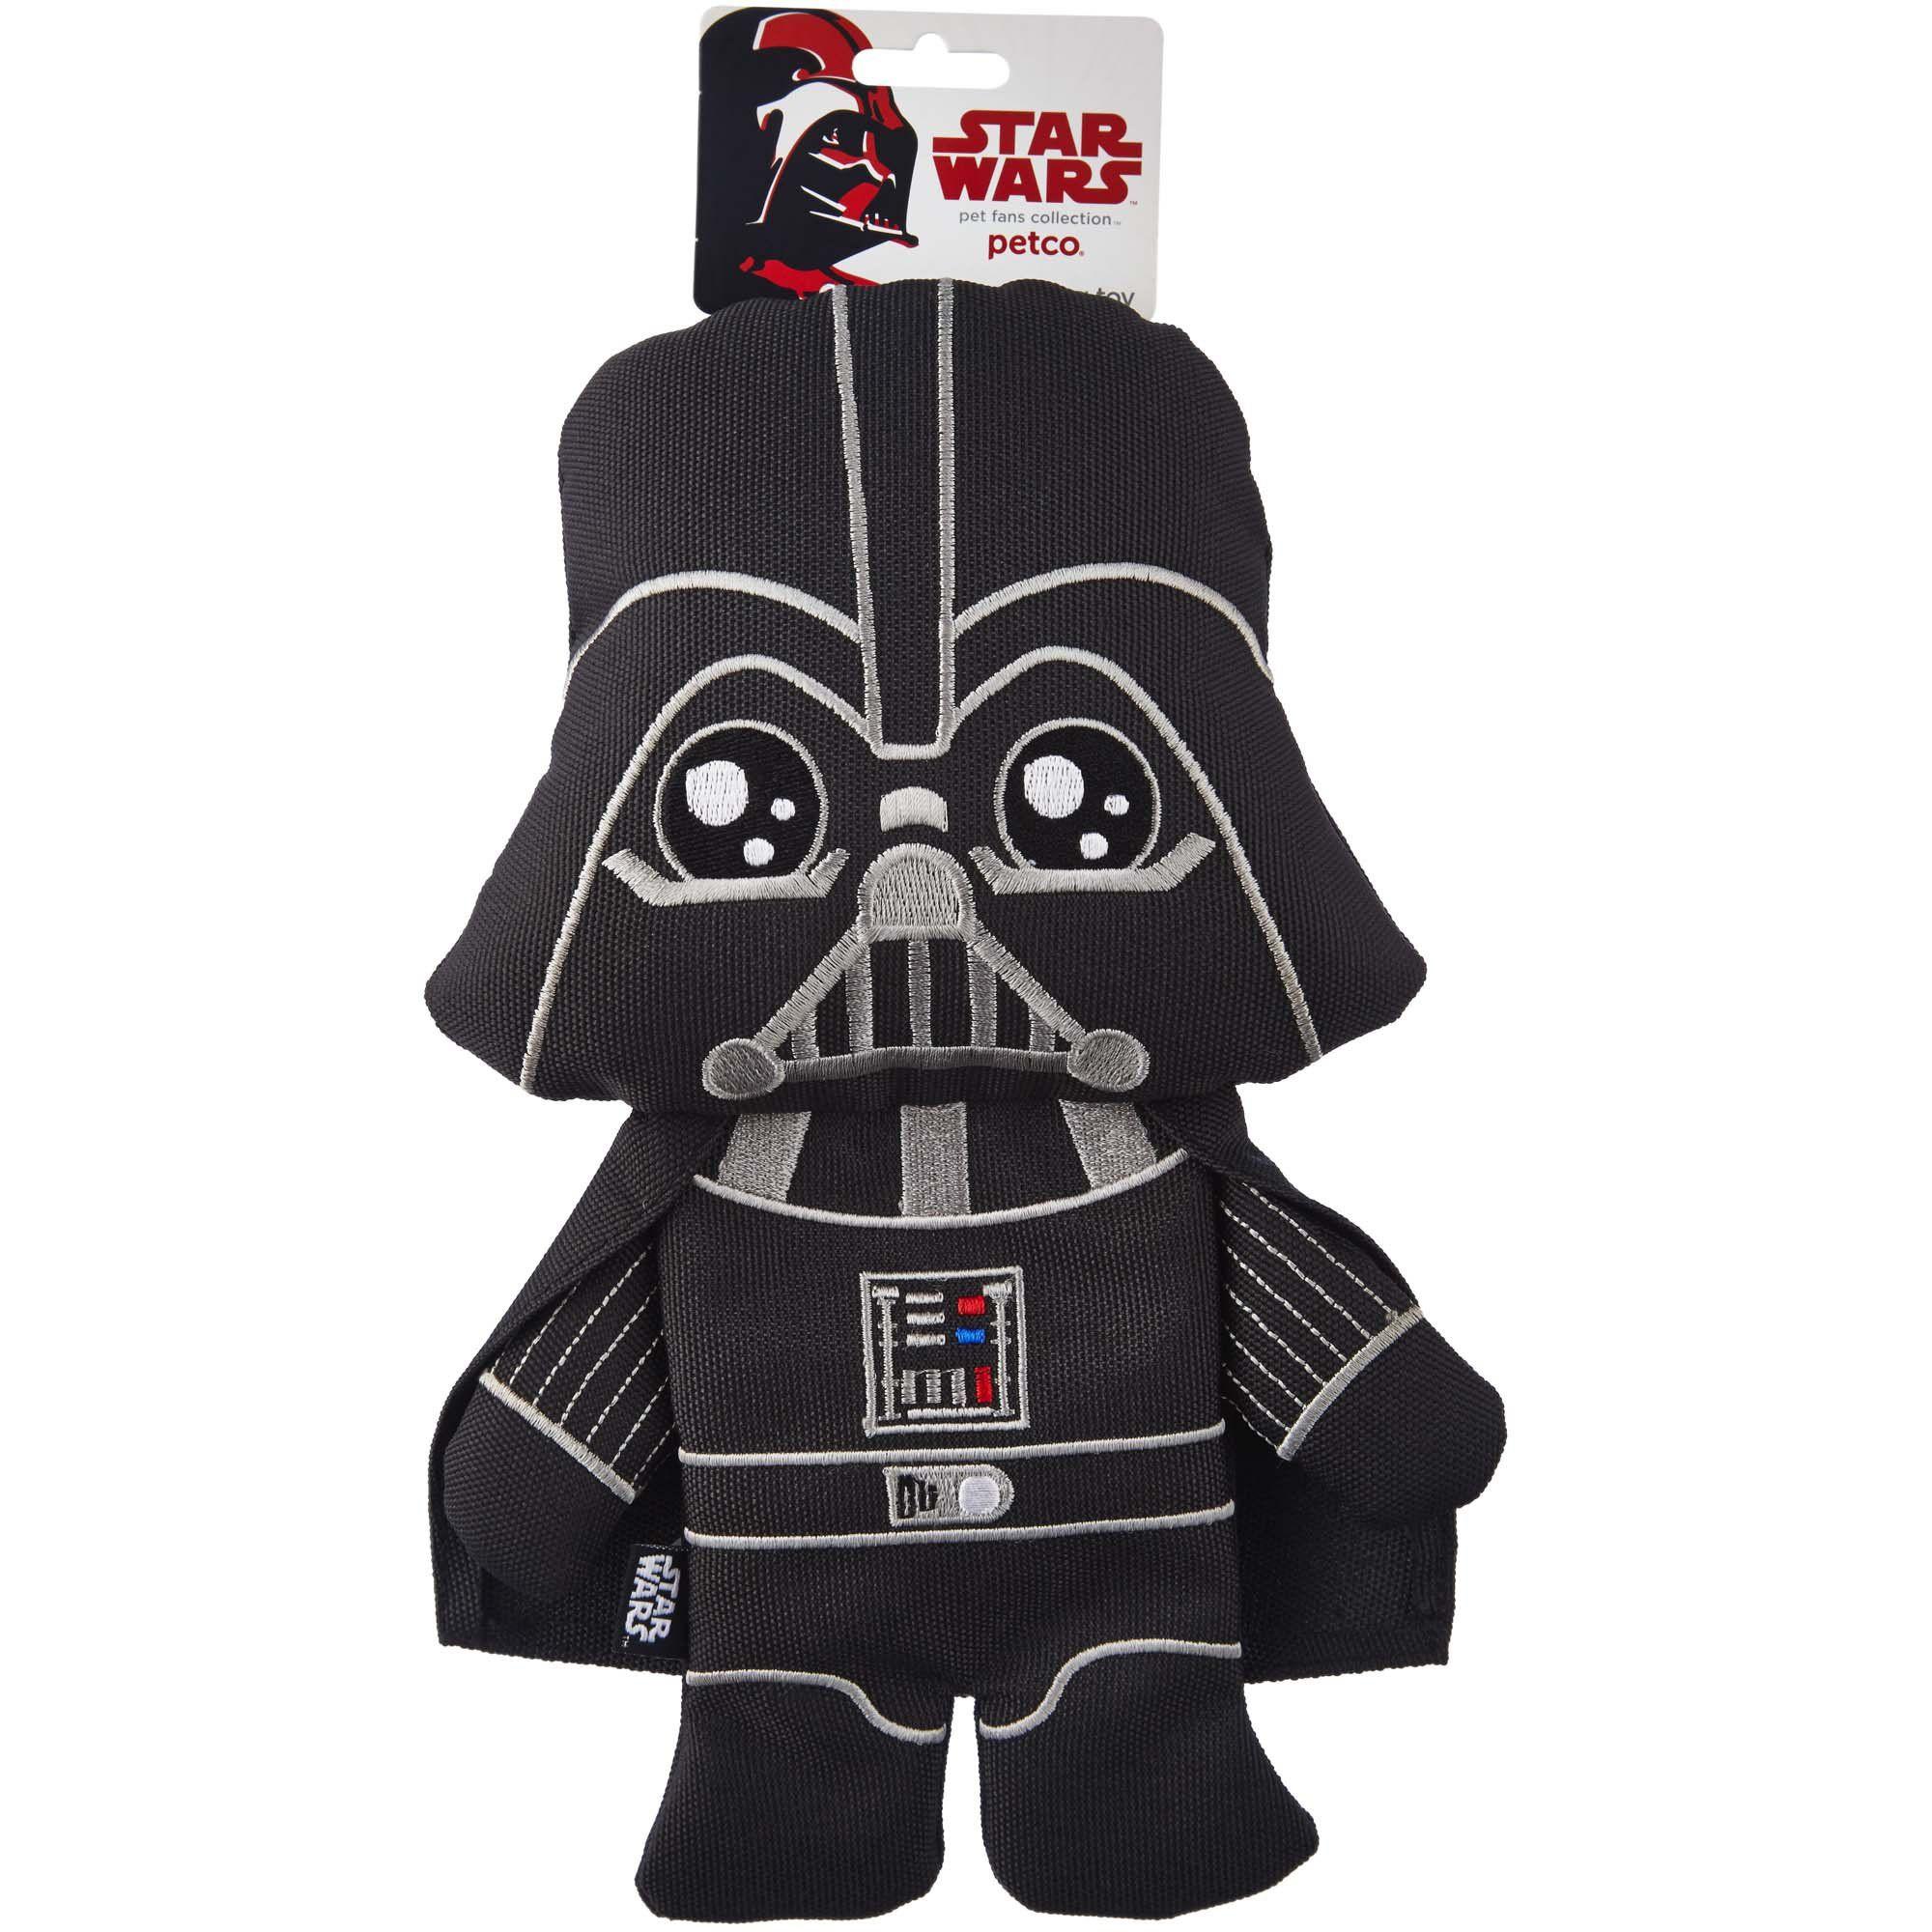 Star Wars Darth Vader Flattie Dog Toy Medium Petco Petco Dog